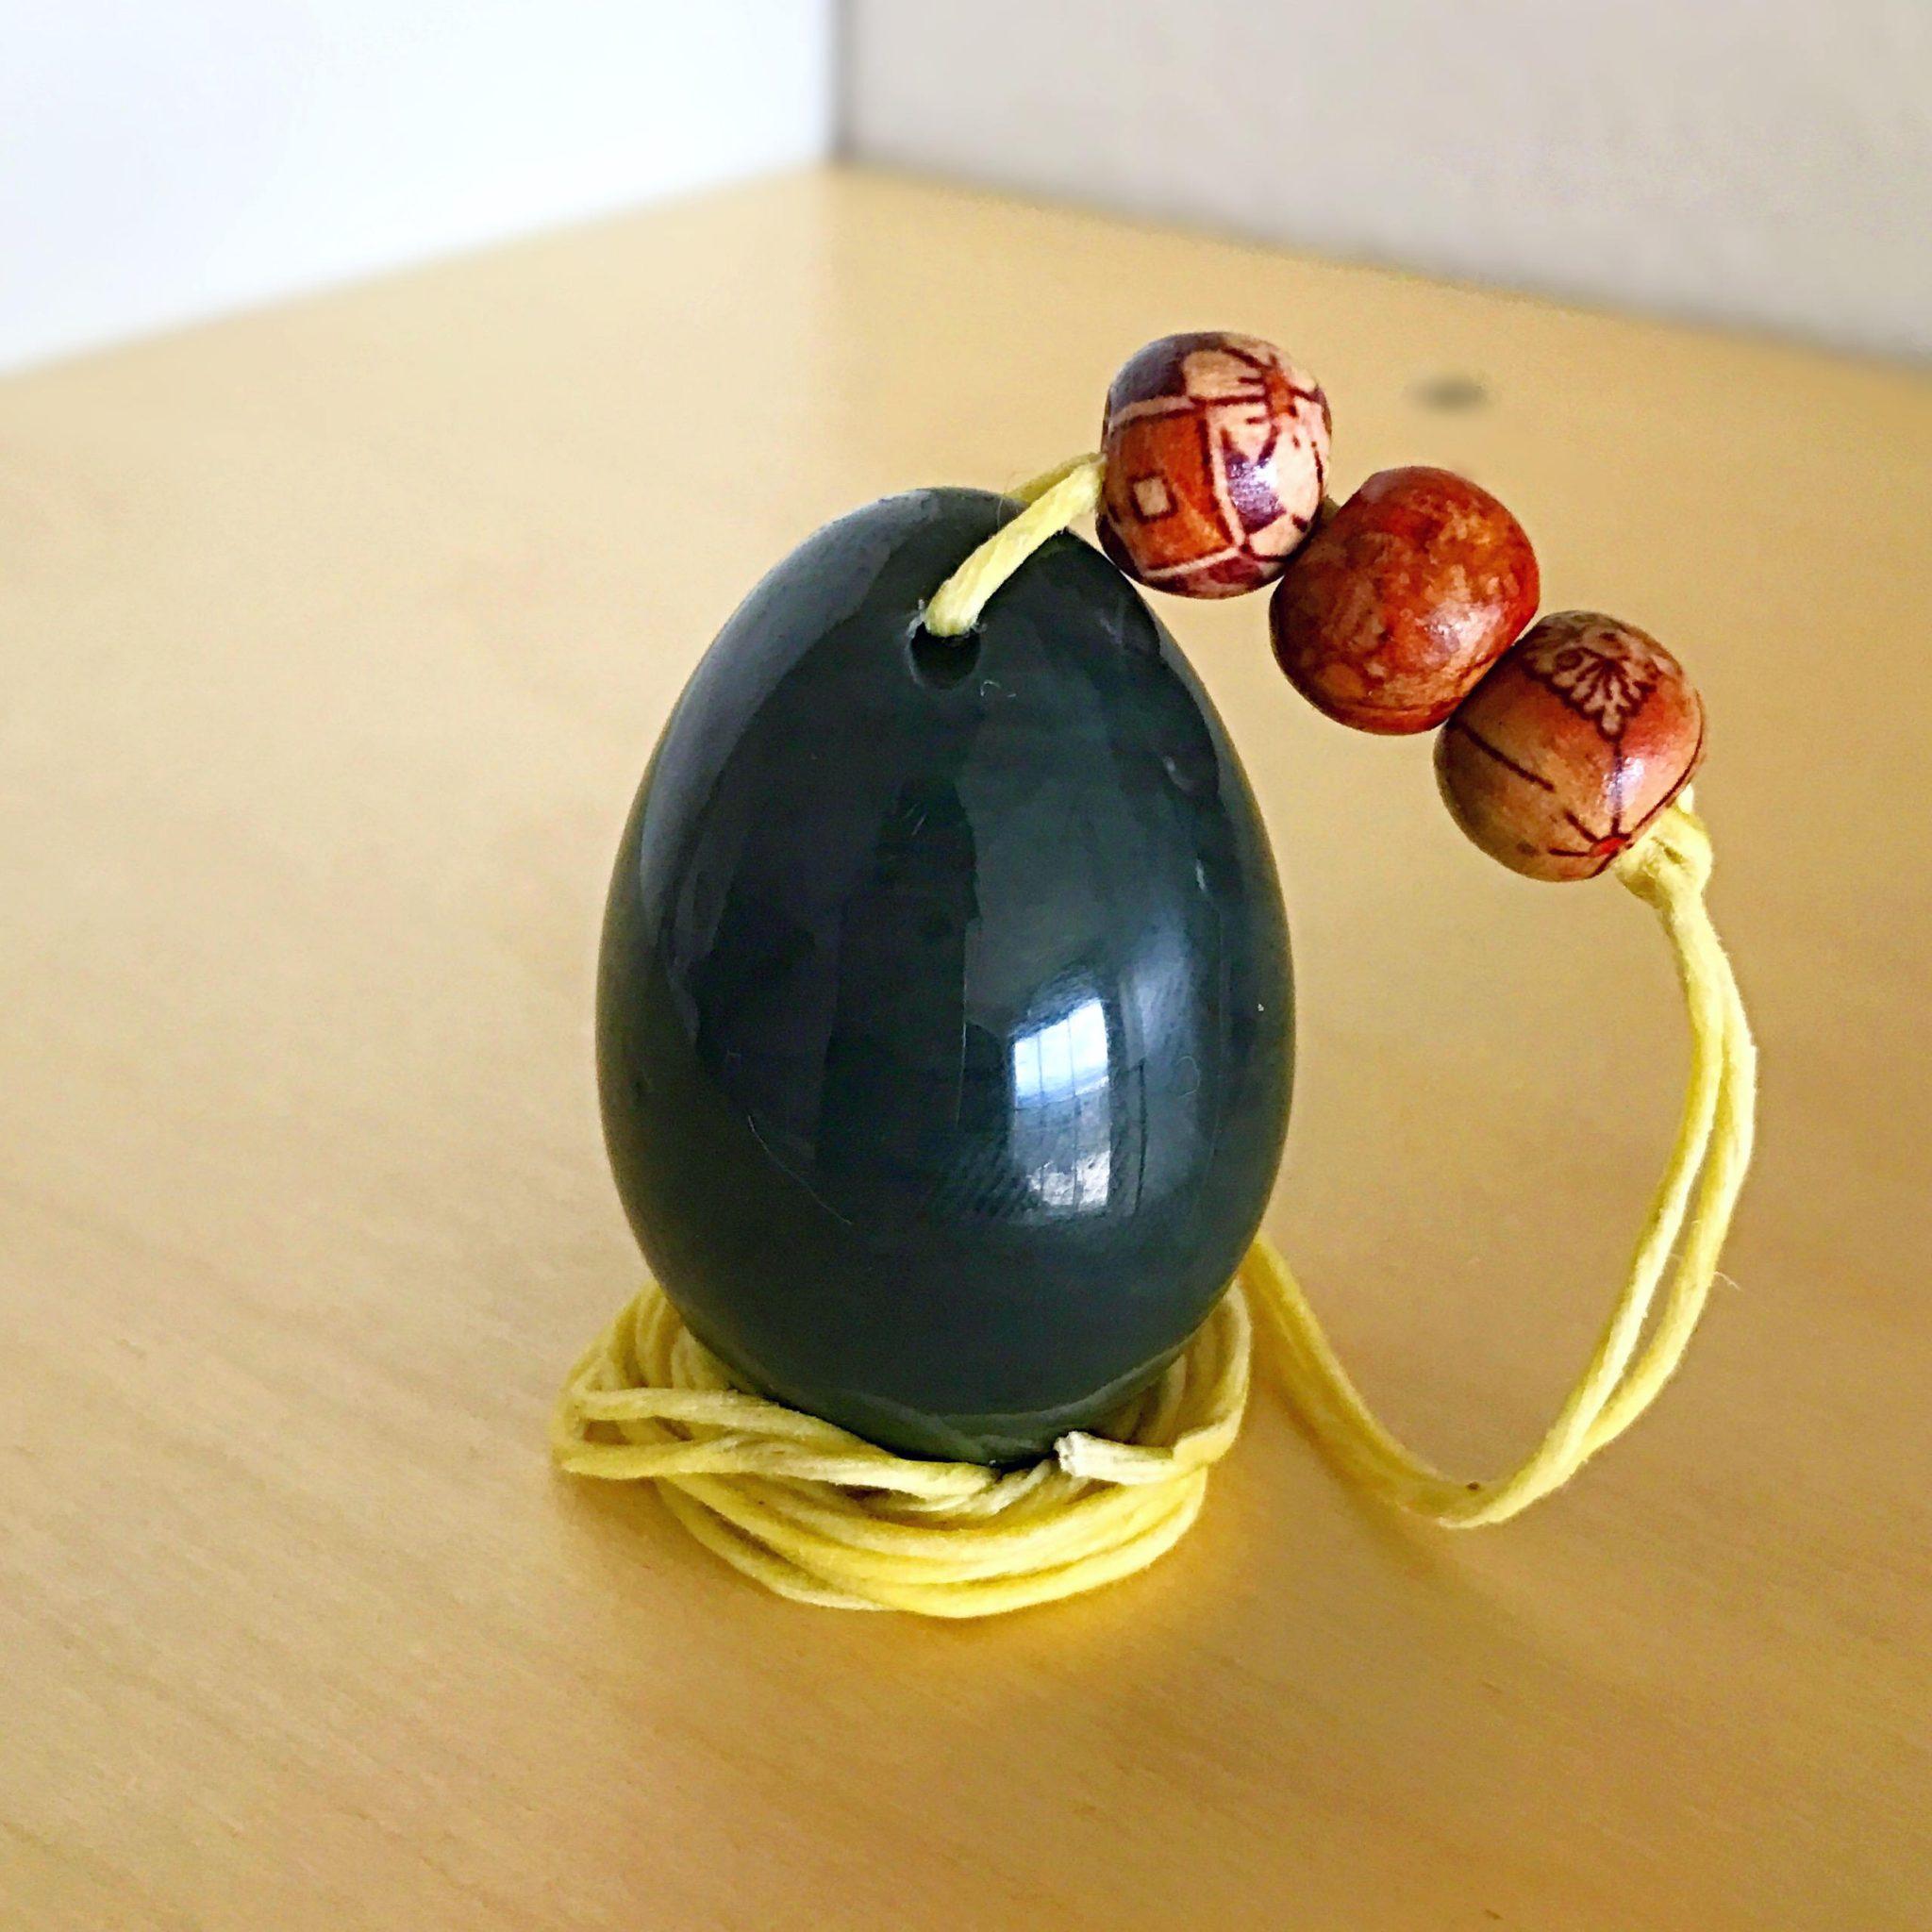 40% OFF Nephrite Jade Yoni Egg